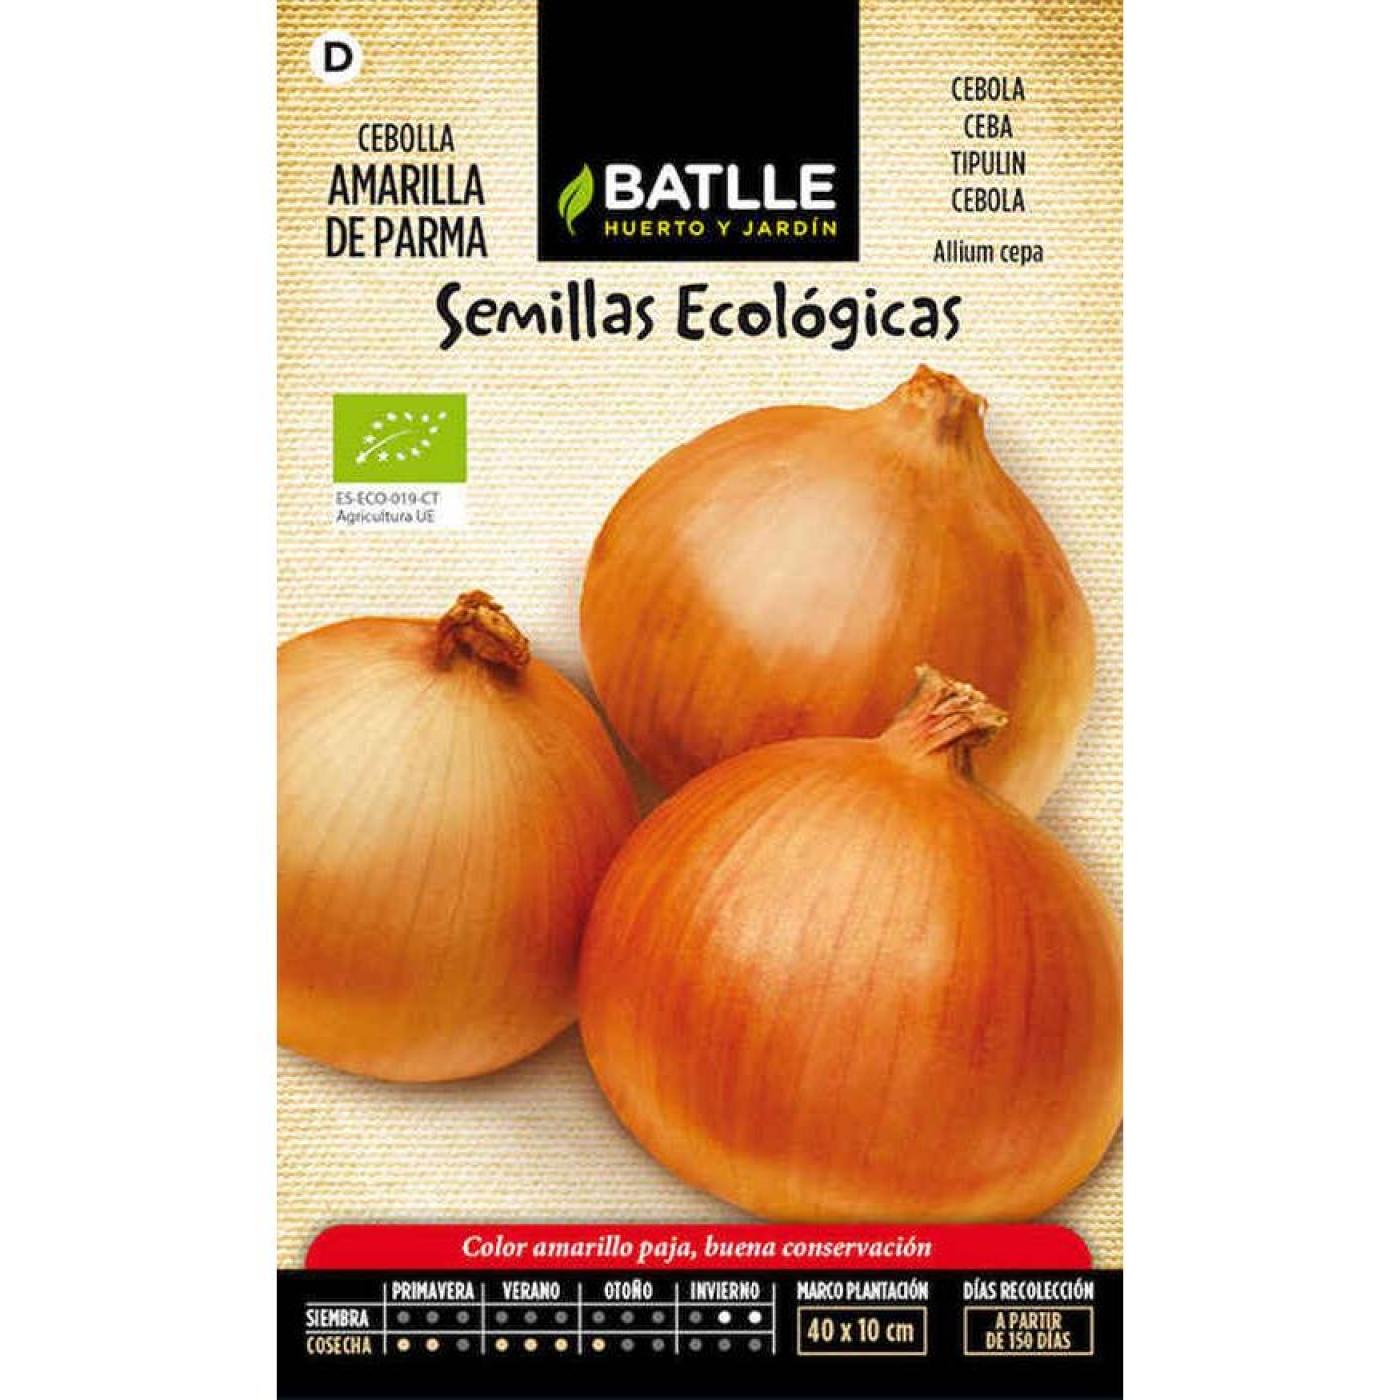 Semillas ecol gicas de cebolla amarilla de parma por 1 60 for Asociacion de cultivos tomate